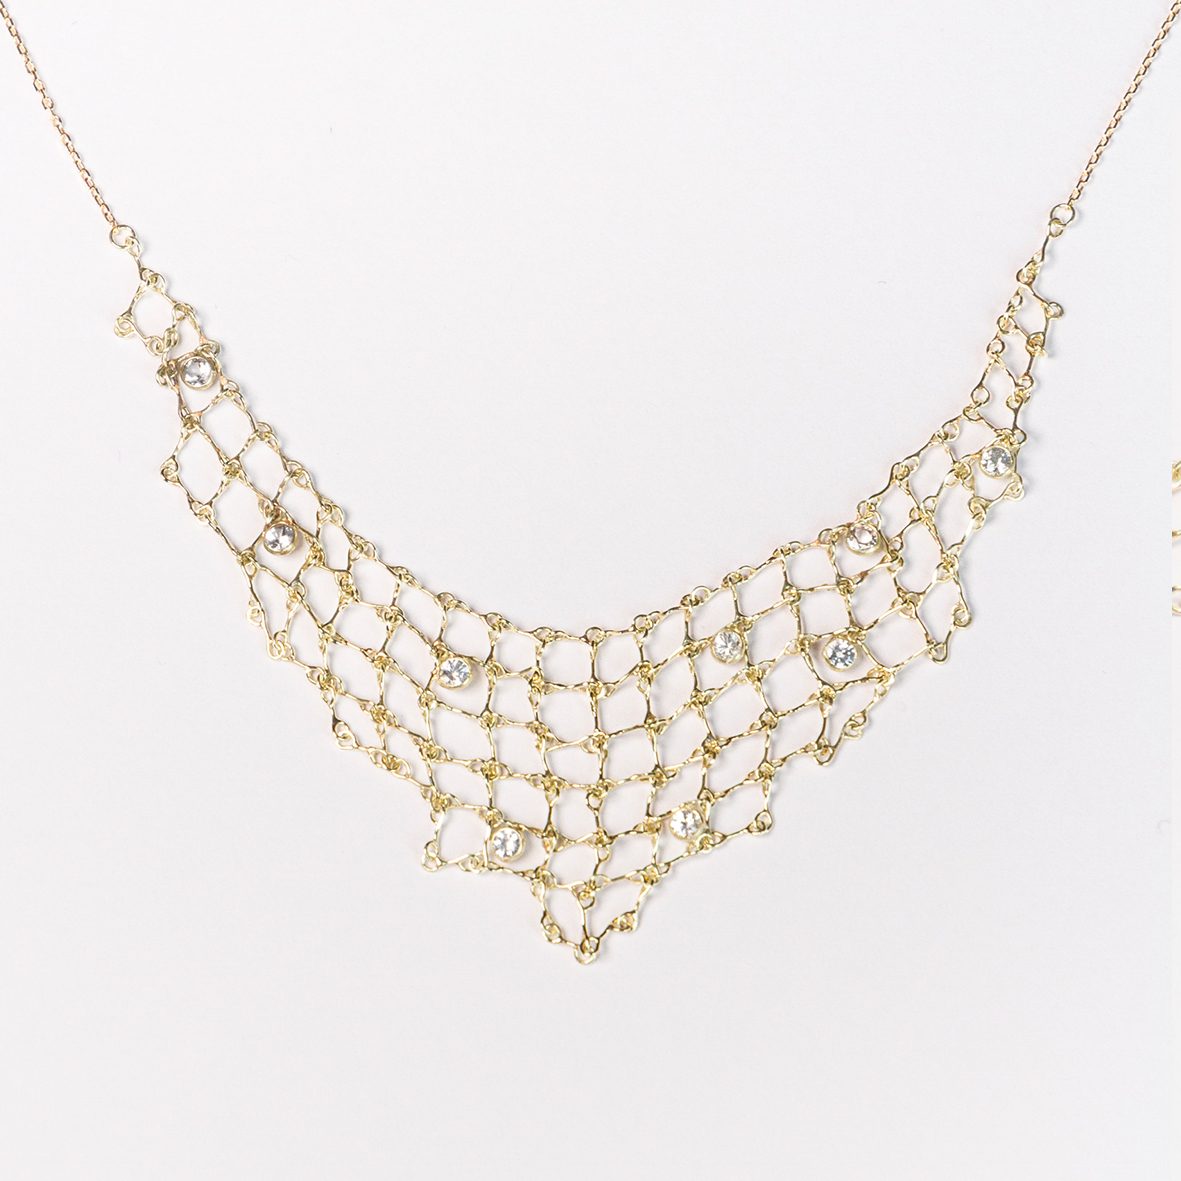 1. OONA_philo_ficha1_sapphire triangle net necklace